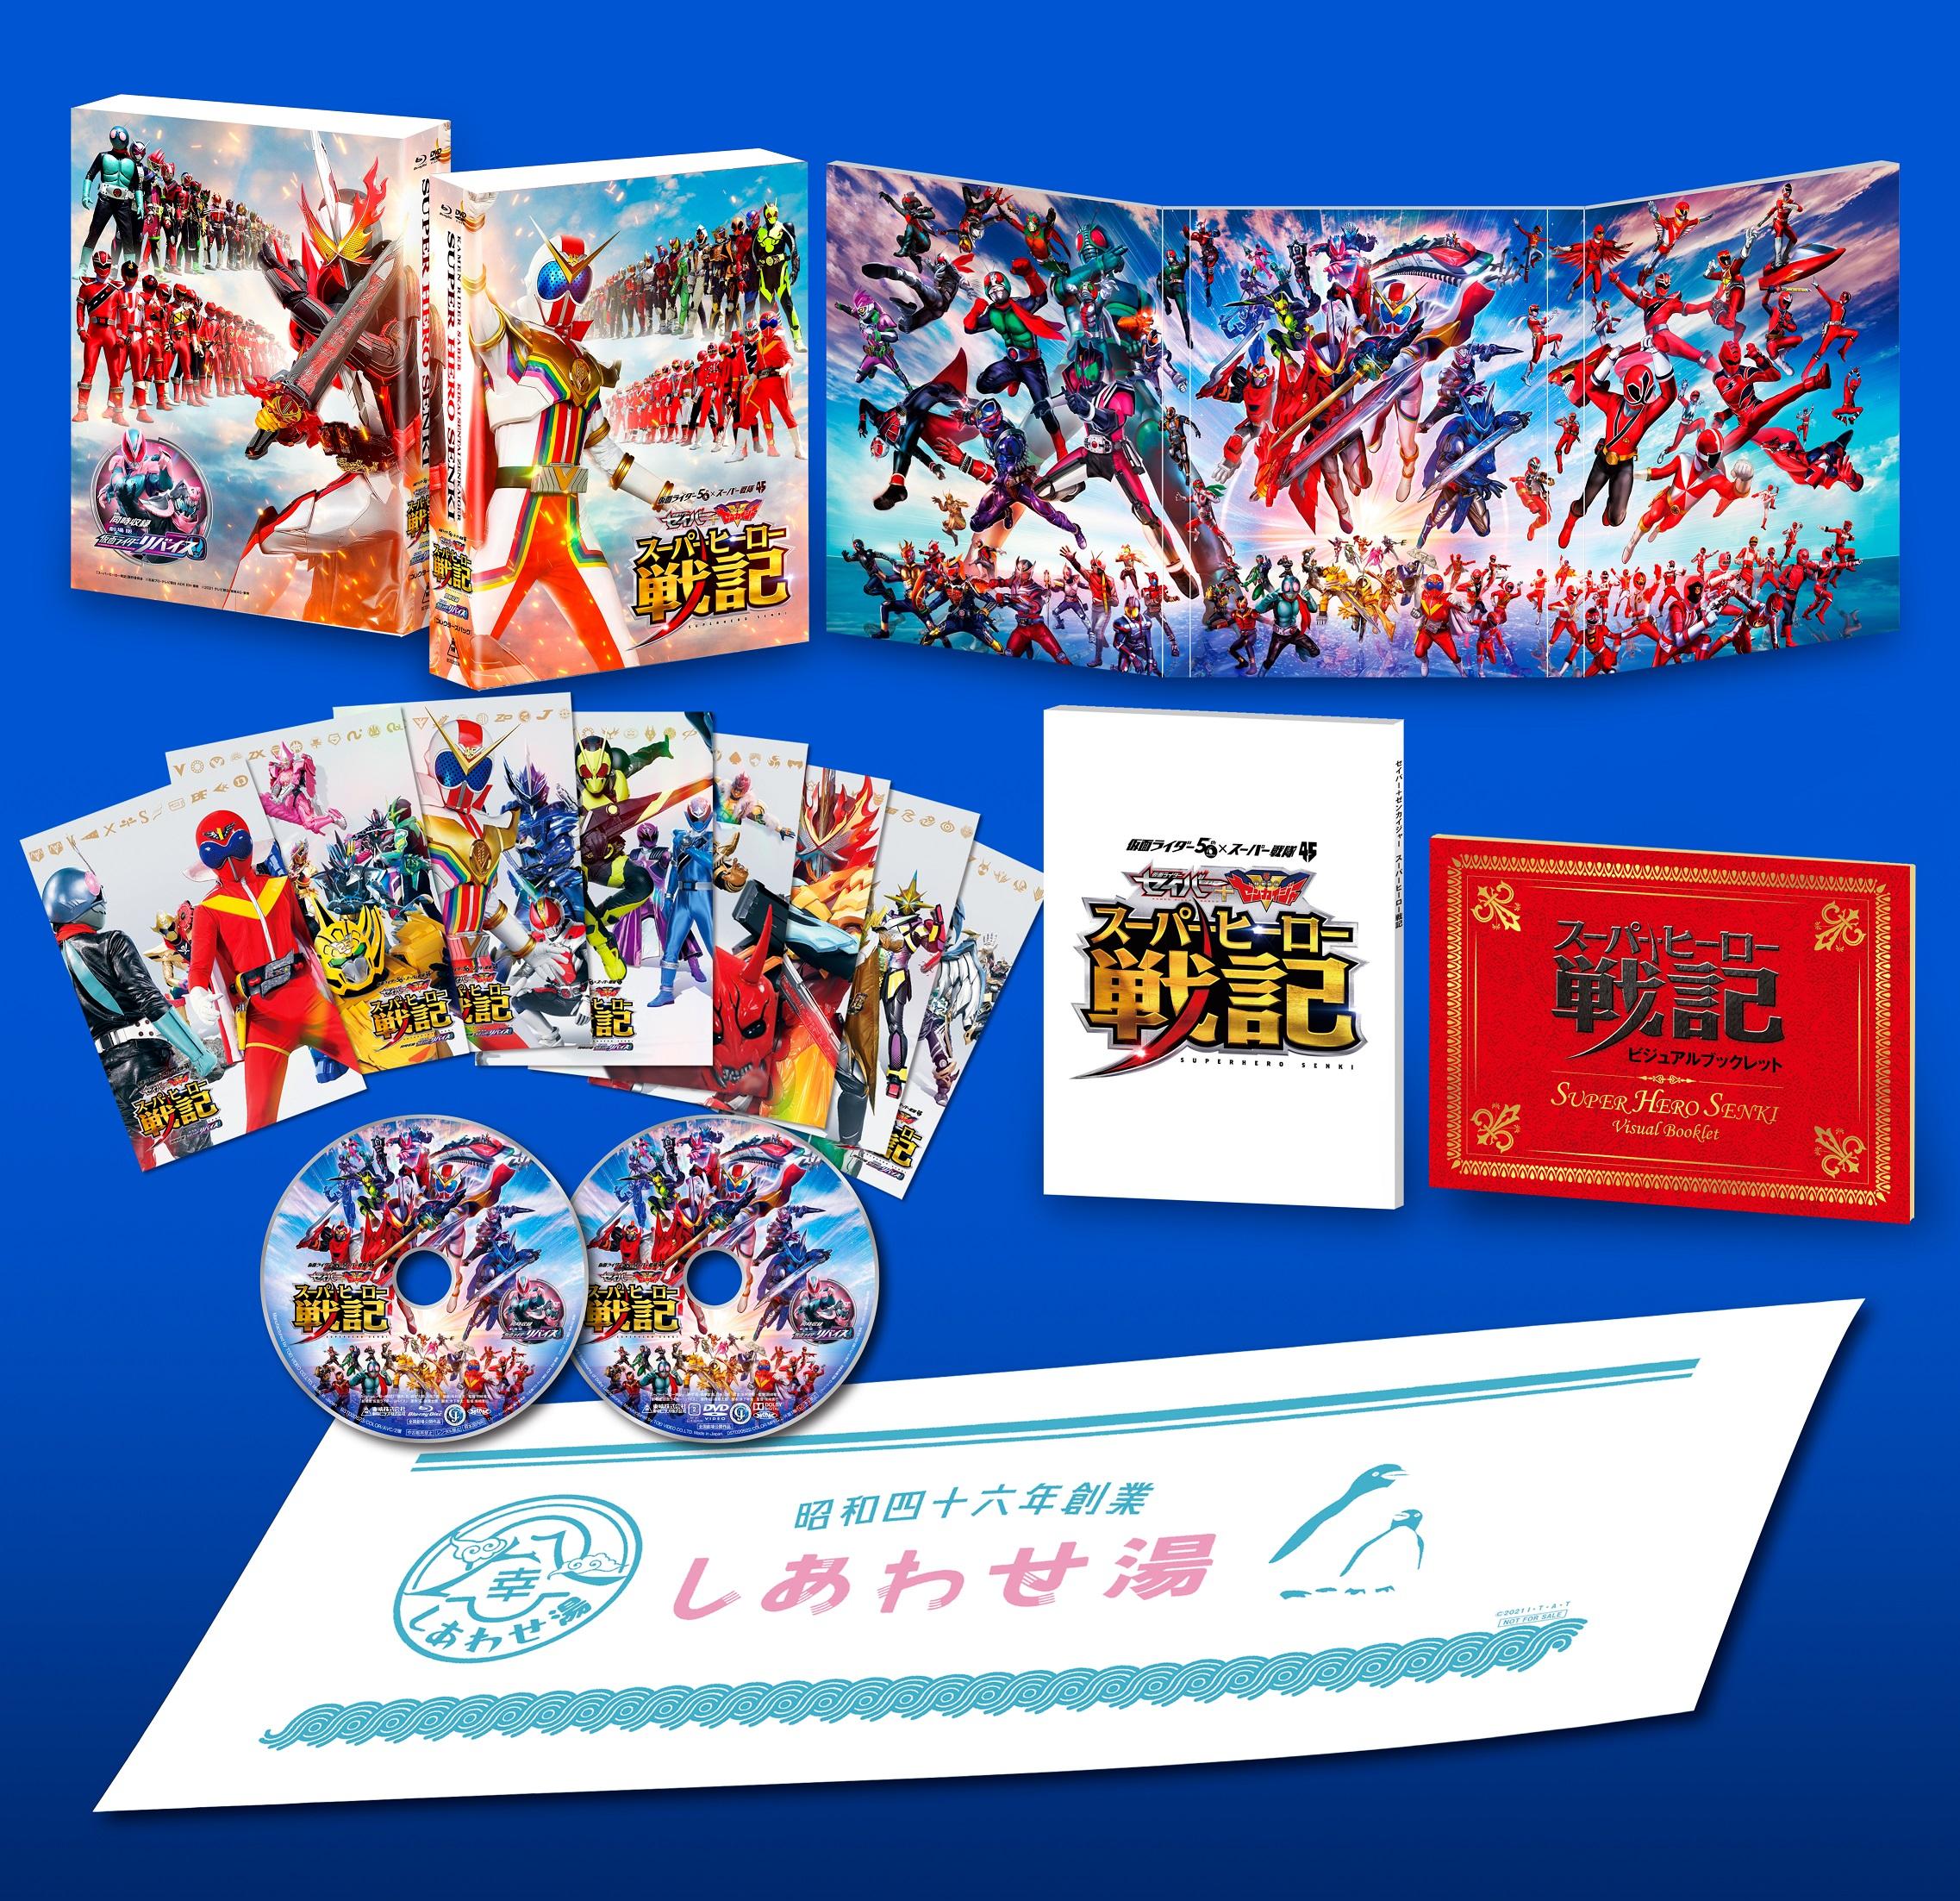 【Blu-ray】セイバー+ゼンカイジャー スーパーヒーロー戦記/劇場版 仮面ライダーリバイス コレクターズパック豪華版(初回生産限定・劇場公開時B1サイズポスター付き)